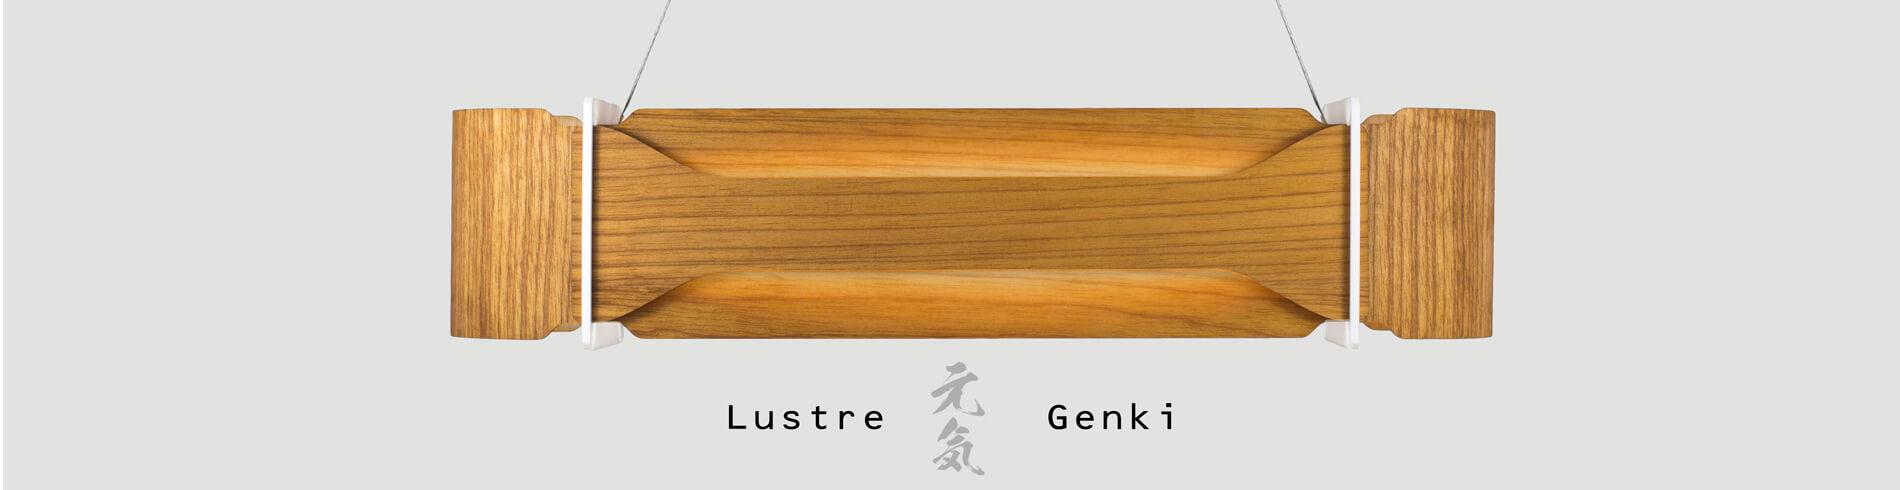 Japandoi - Genki